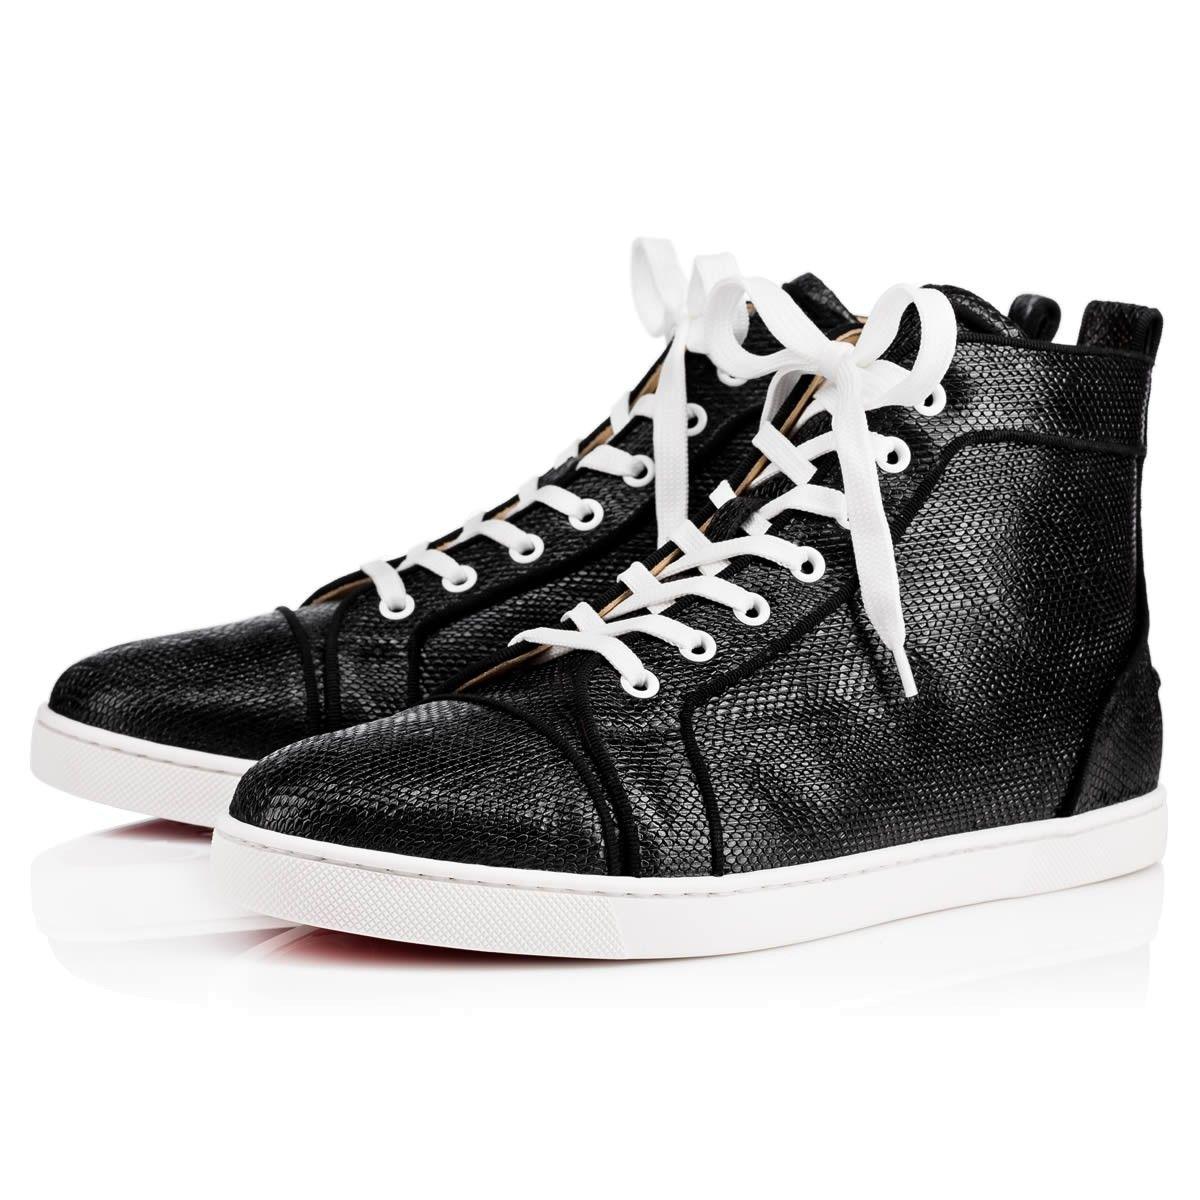 80a48a69f0f7 CHRISTIAN LOUBOUTIN Bip Bip Orlato Flat Black Leather - Men Shoes - Christian  Louboutin.  christianlouboutin  shoes